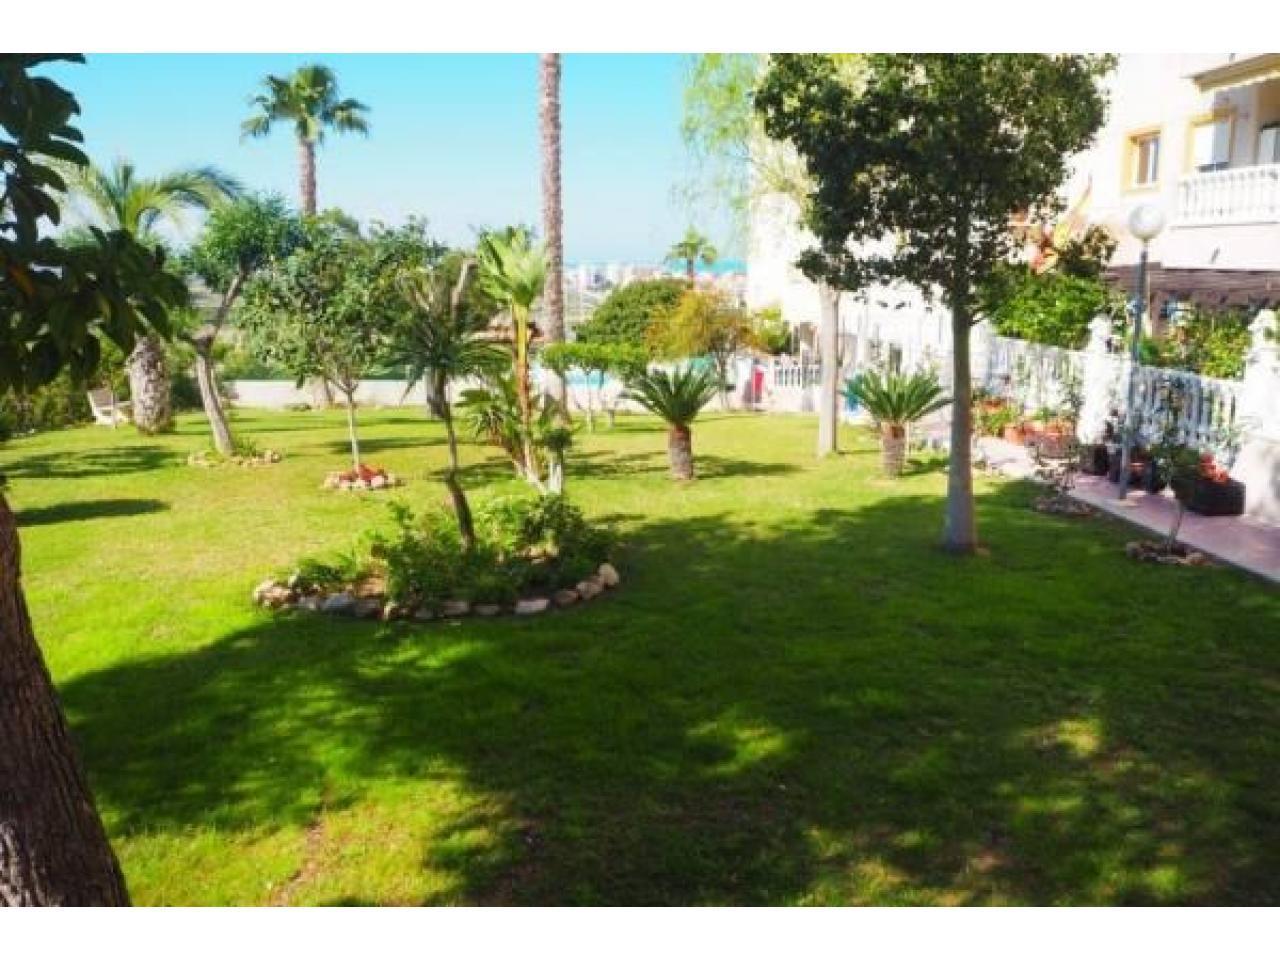 Недвижимость в Испании, Квартира c видами на море в Торревьеха,Коста Бланка,Испания - 4